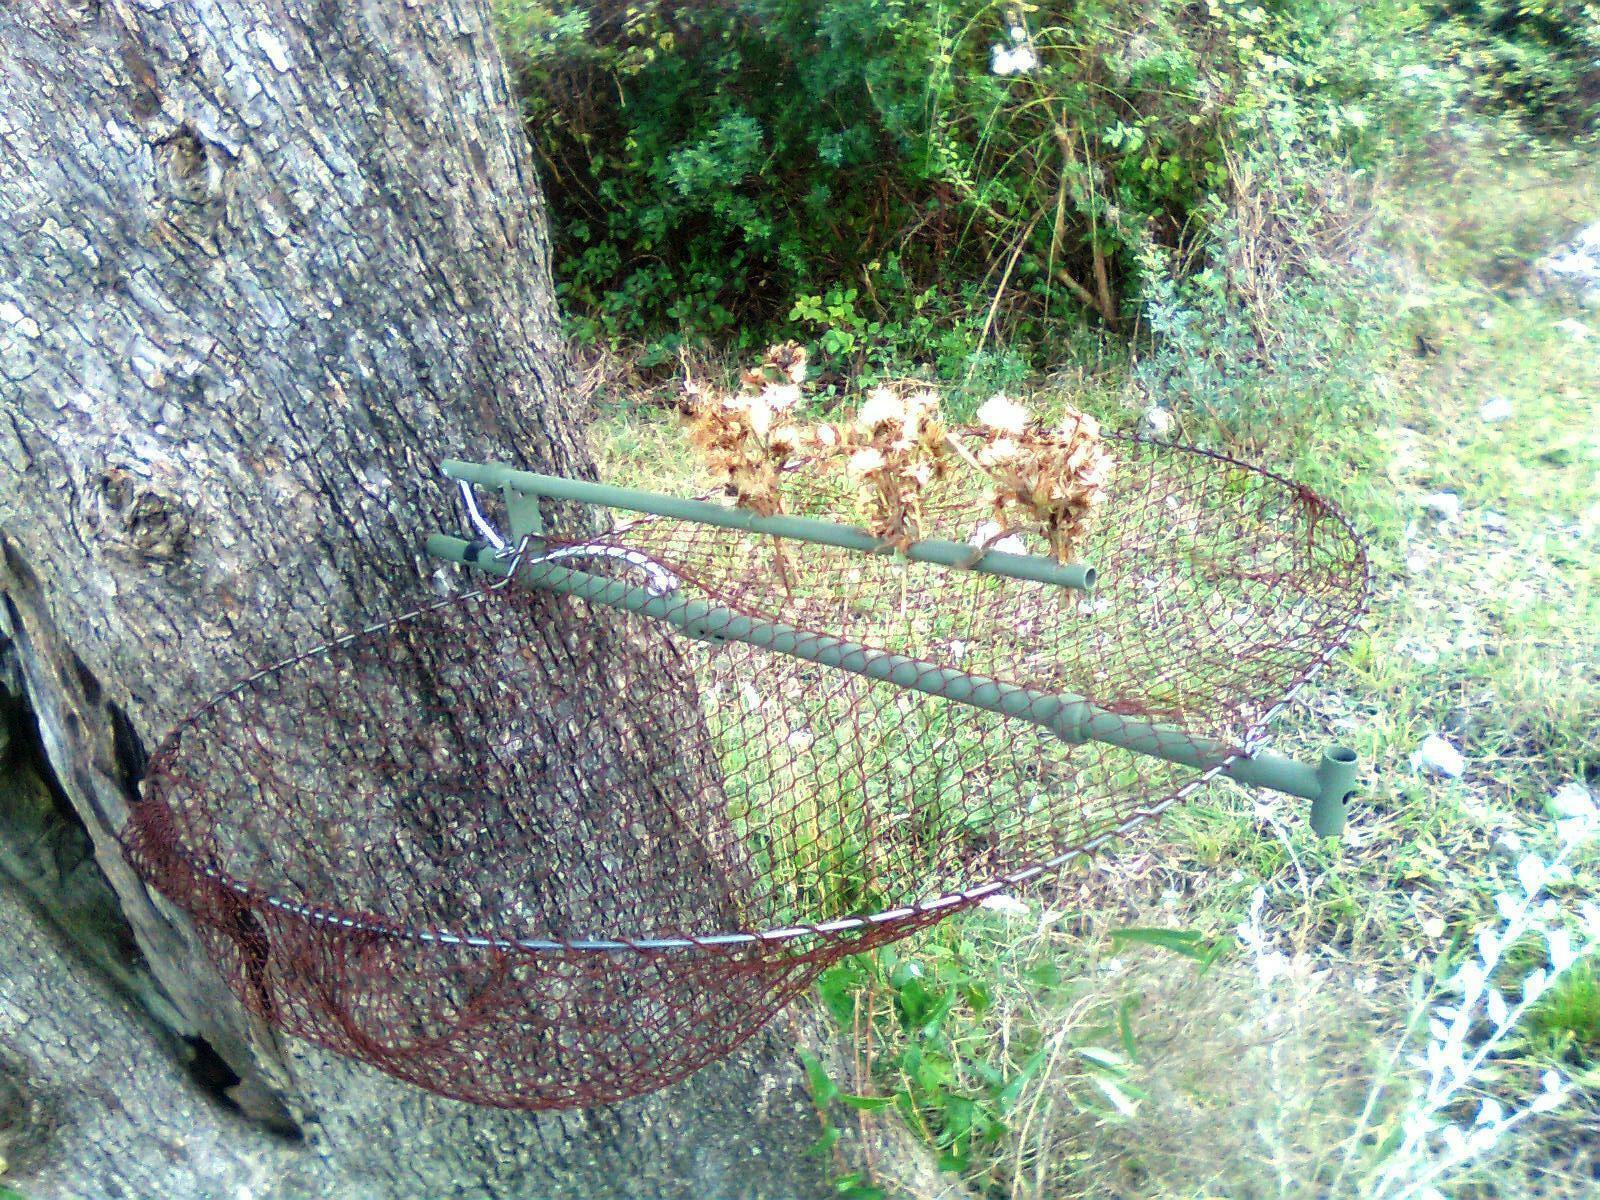 Net Live Maxi Bird Trap 45 cm Trappola Uccelli Piege Oiseaux Trampa Pajaros Cage